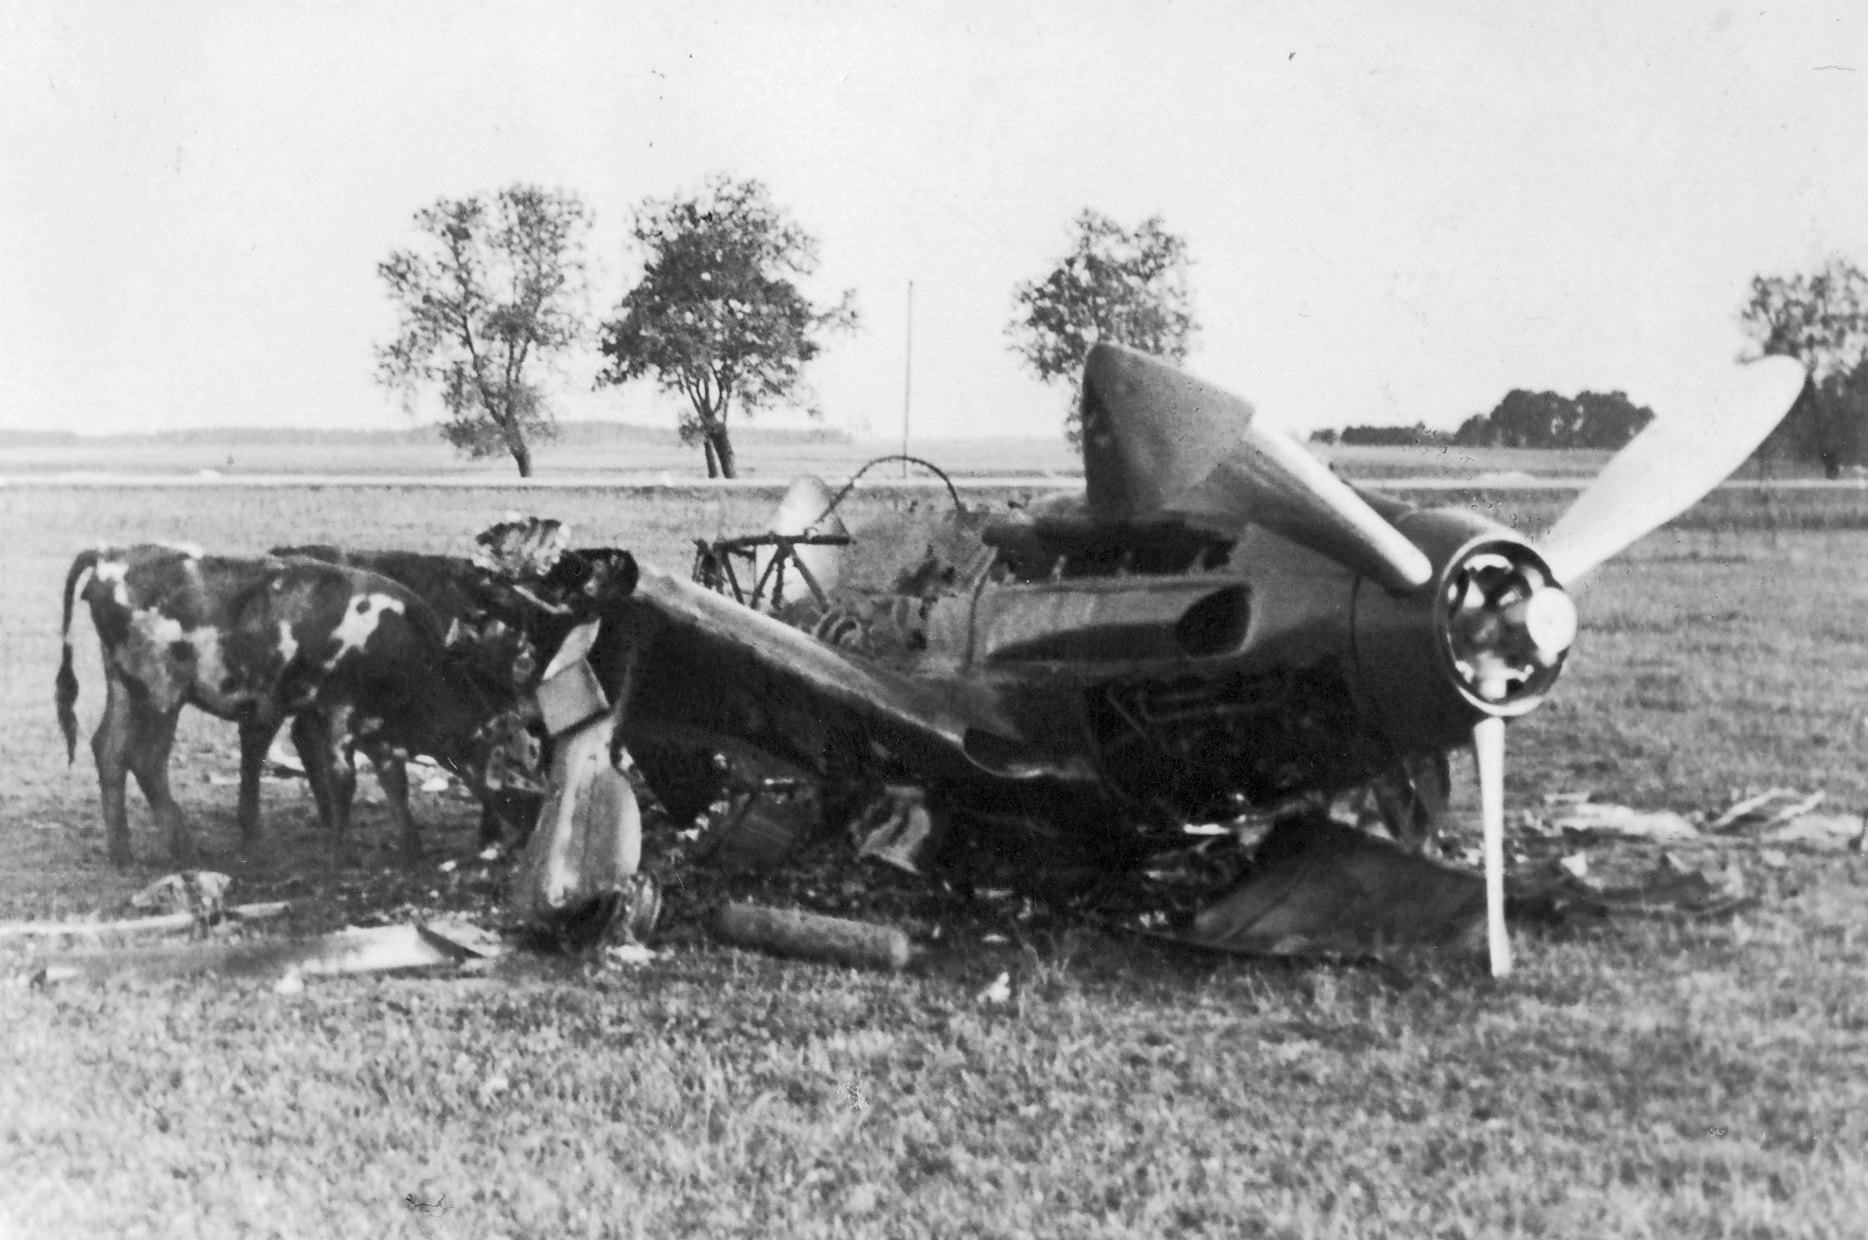 File:Operation Barbarossa - Russian plane.jpg - Wikimedia Commons